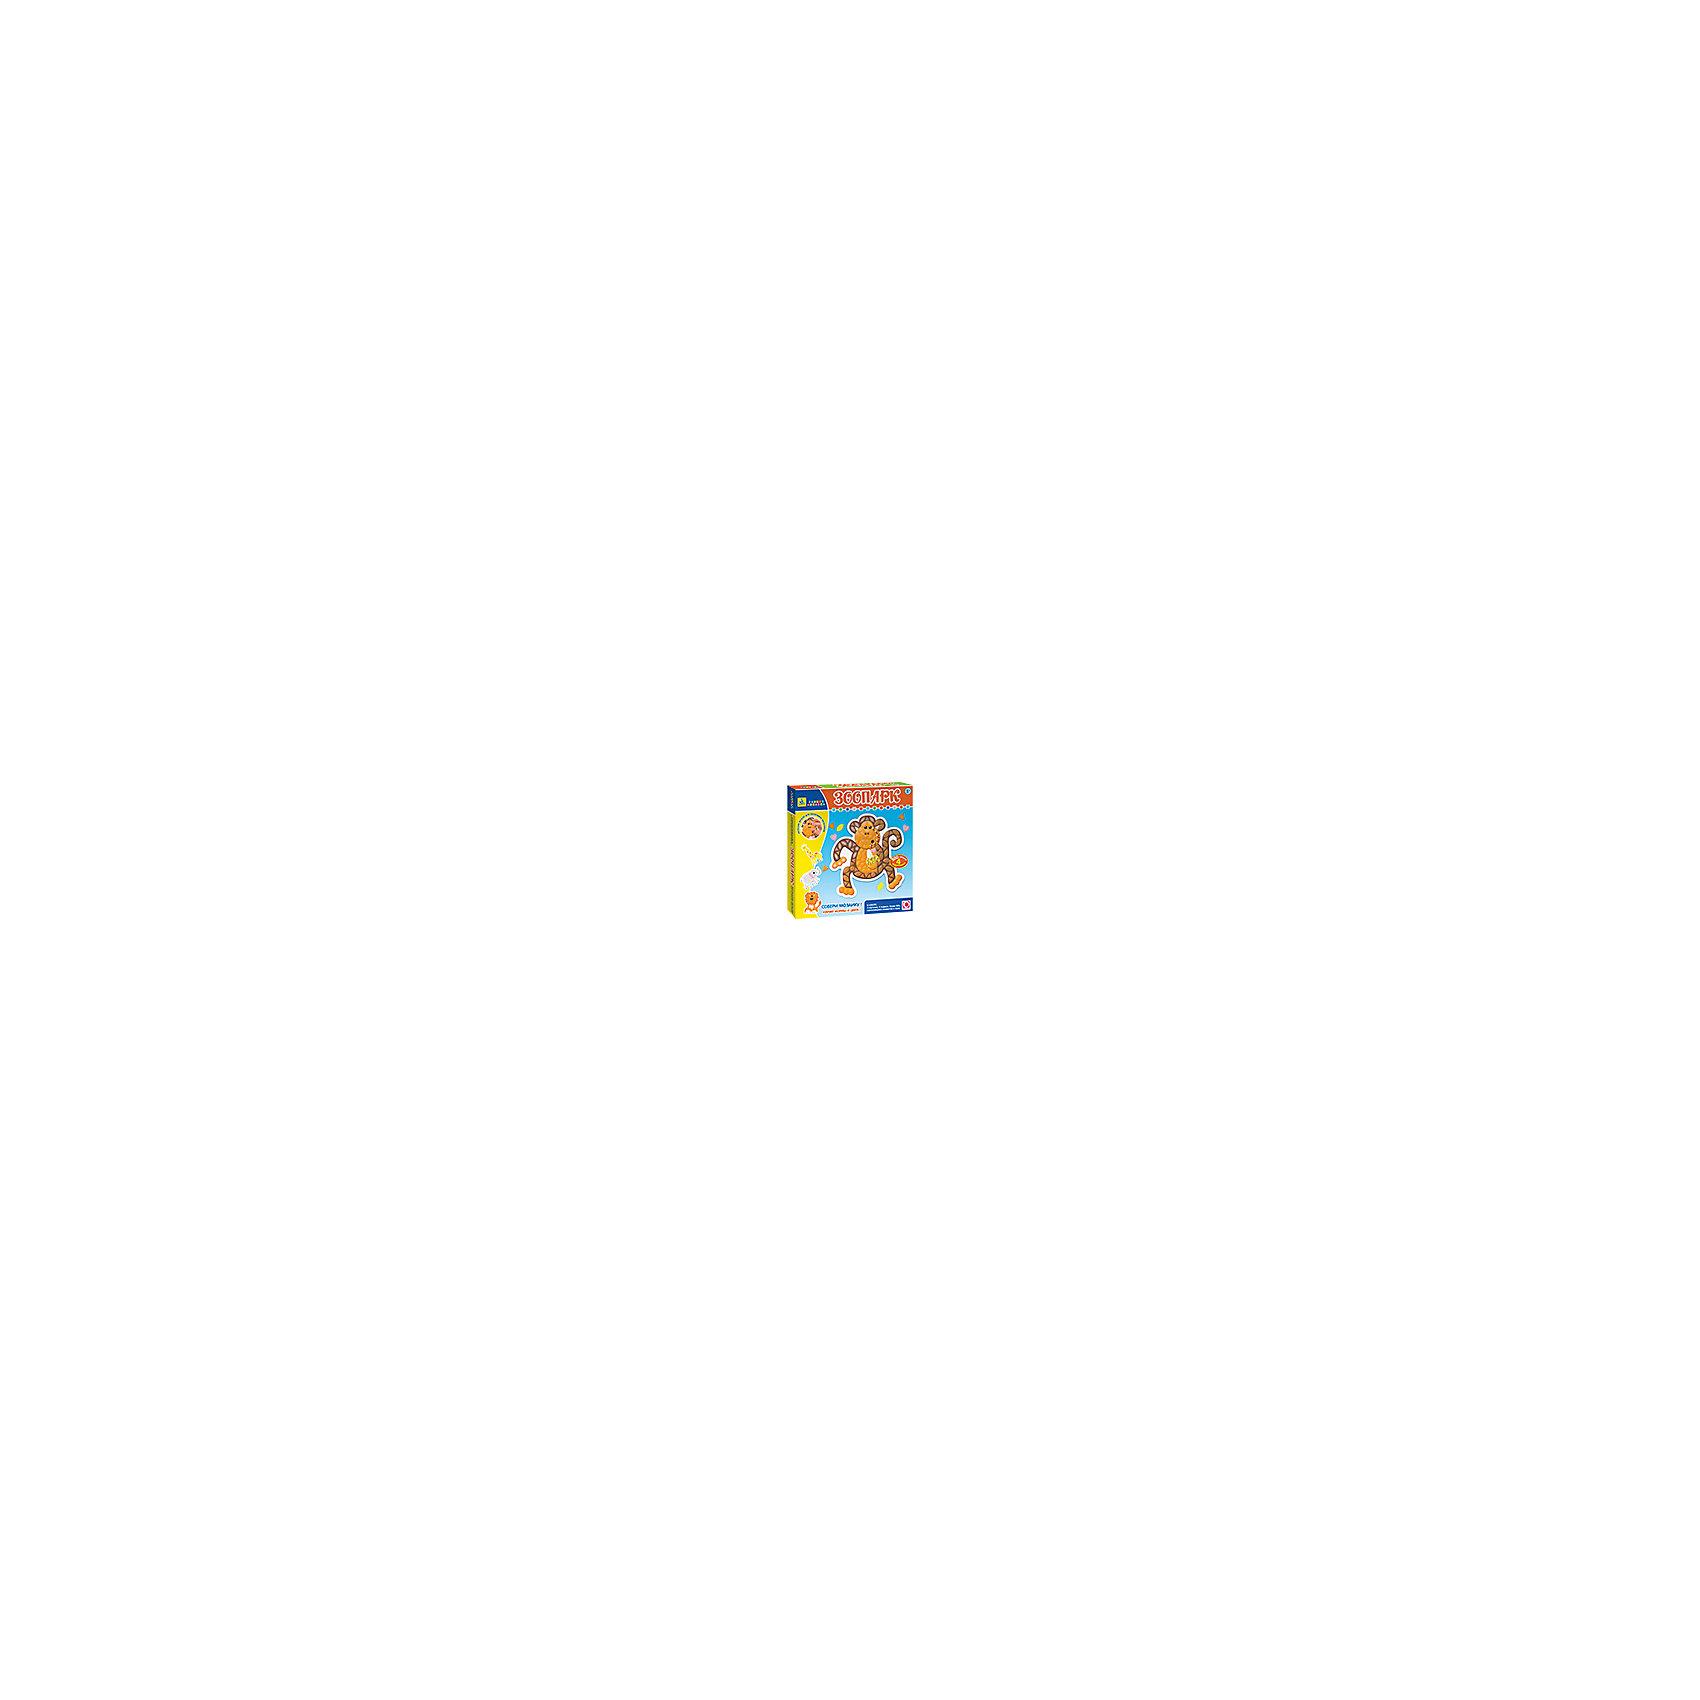 Orb Factory Мозаика-набор для малышей  Зоопарк пазл step puzzle 104 эл disney рапунцель 82131